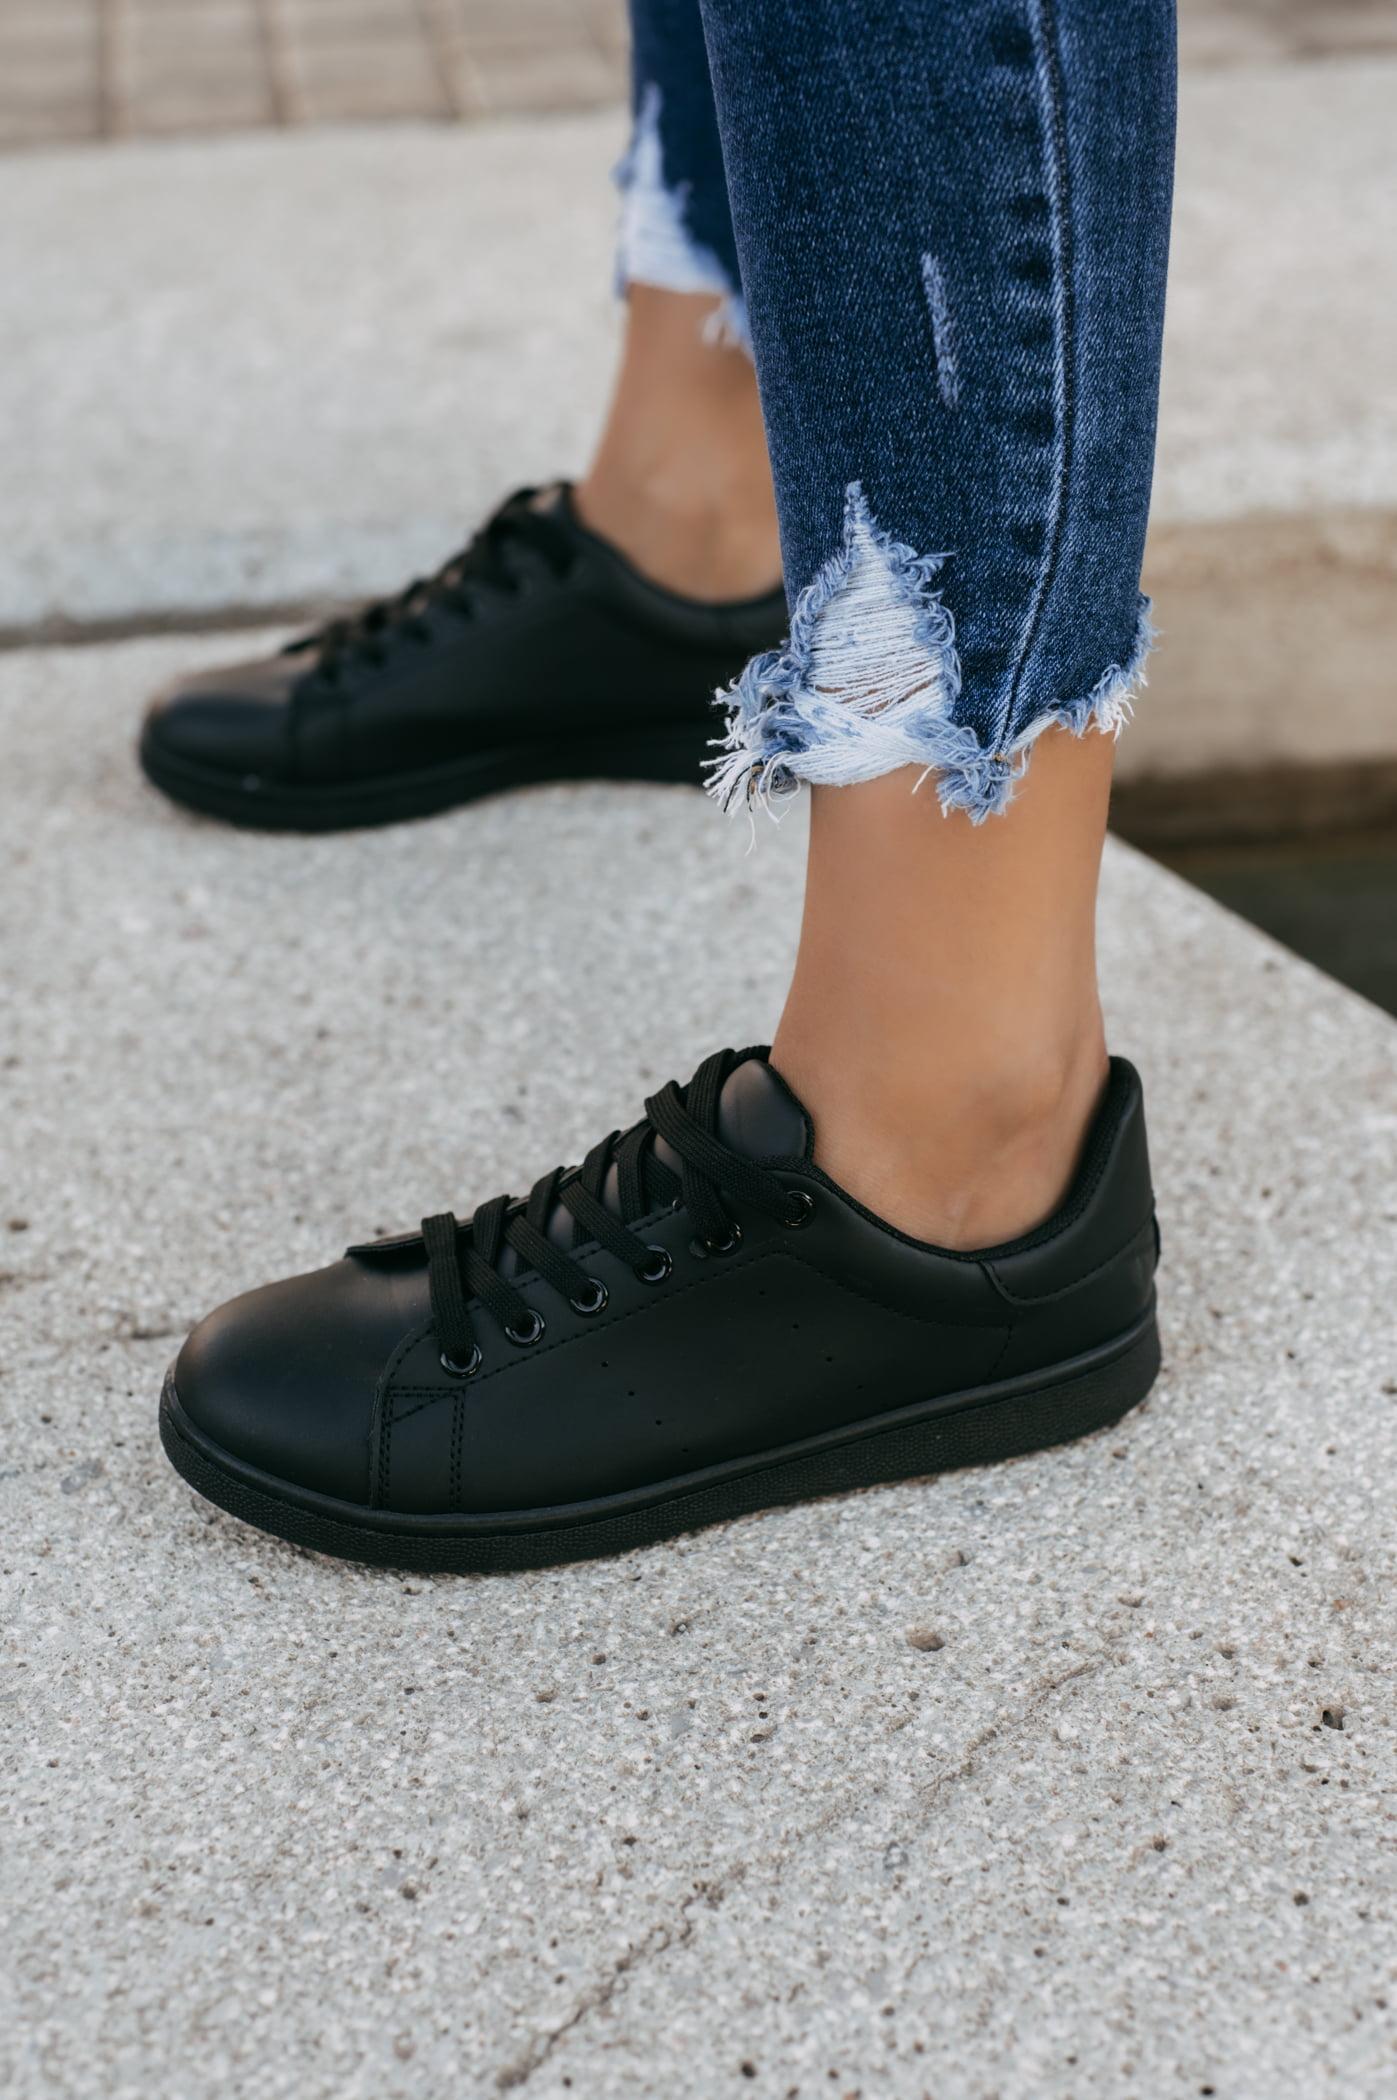 antithesis-clothing-sneakers-basic-mavra (1)